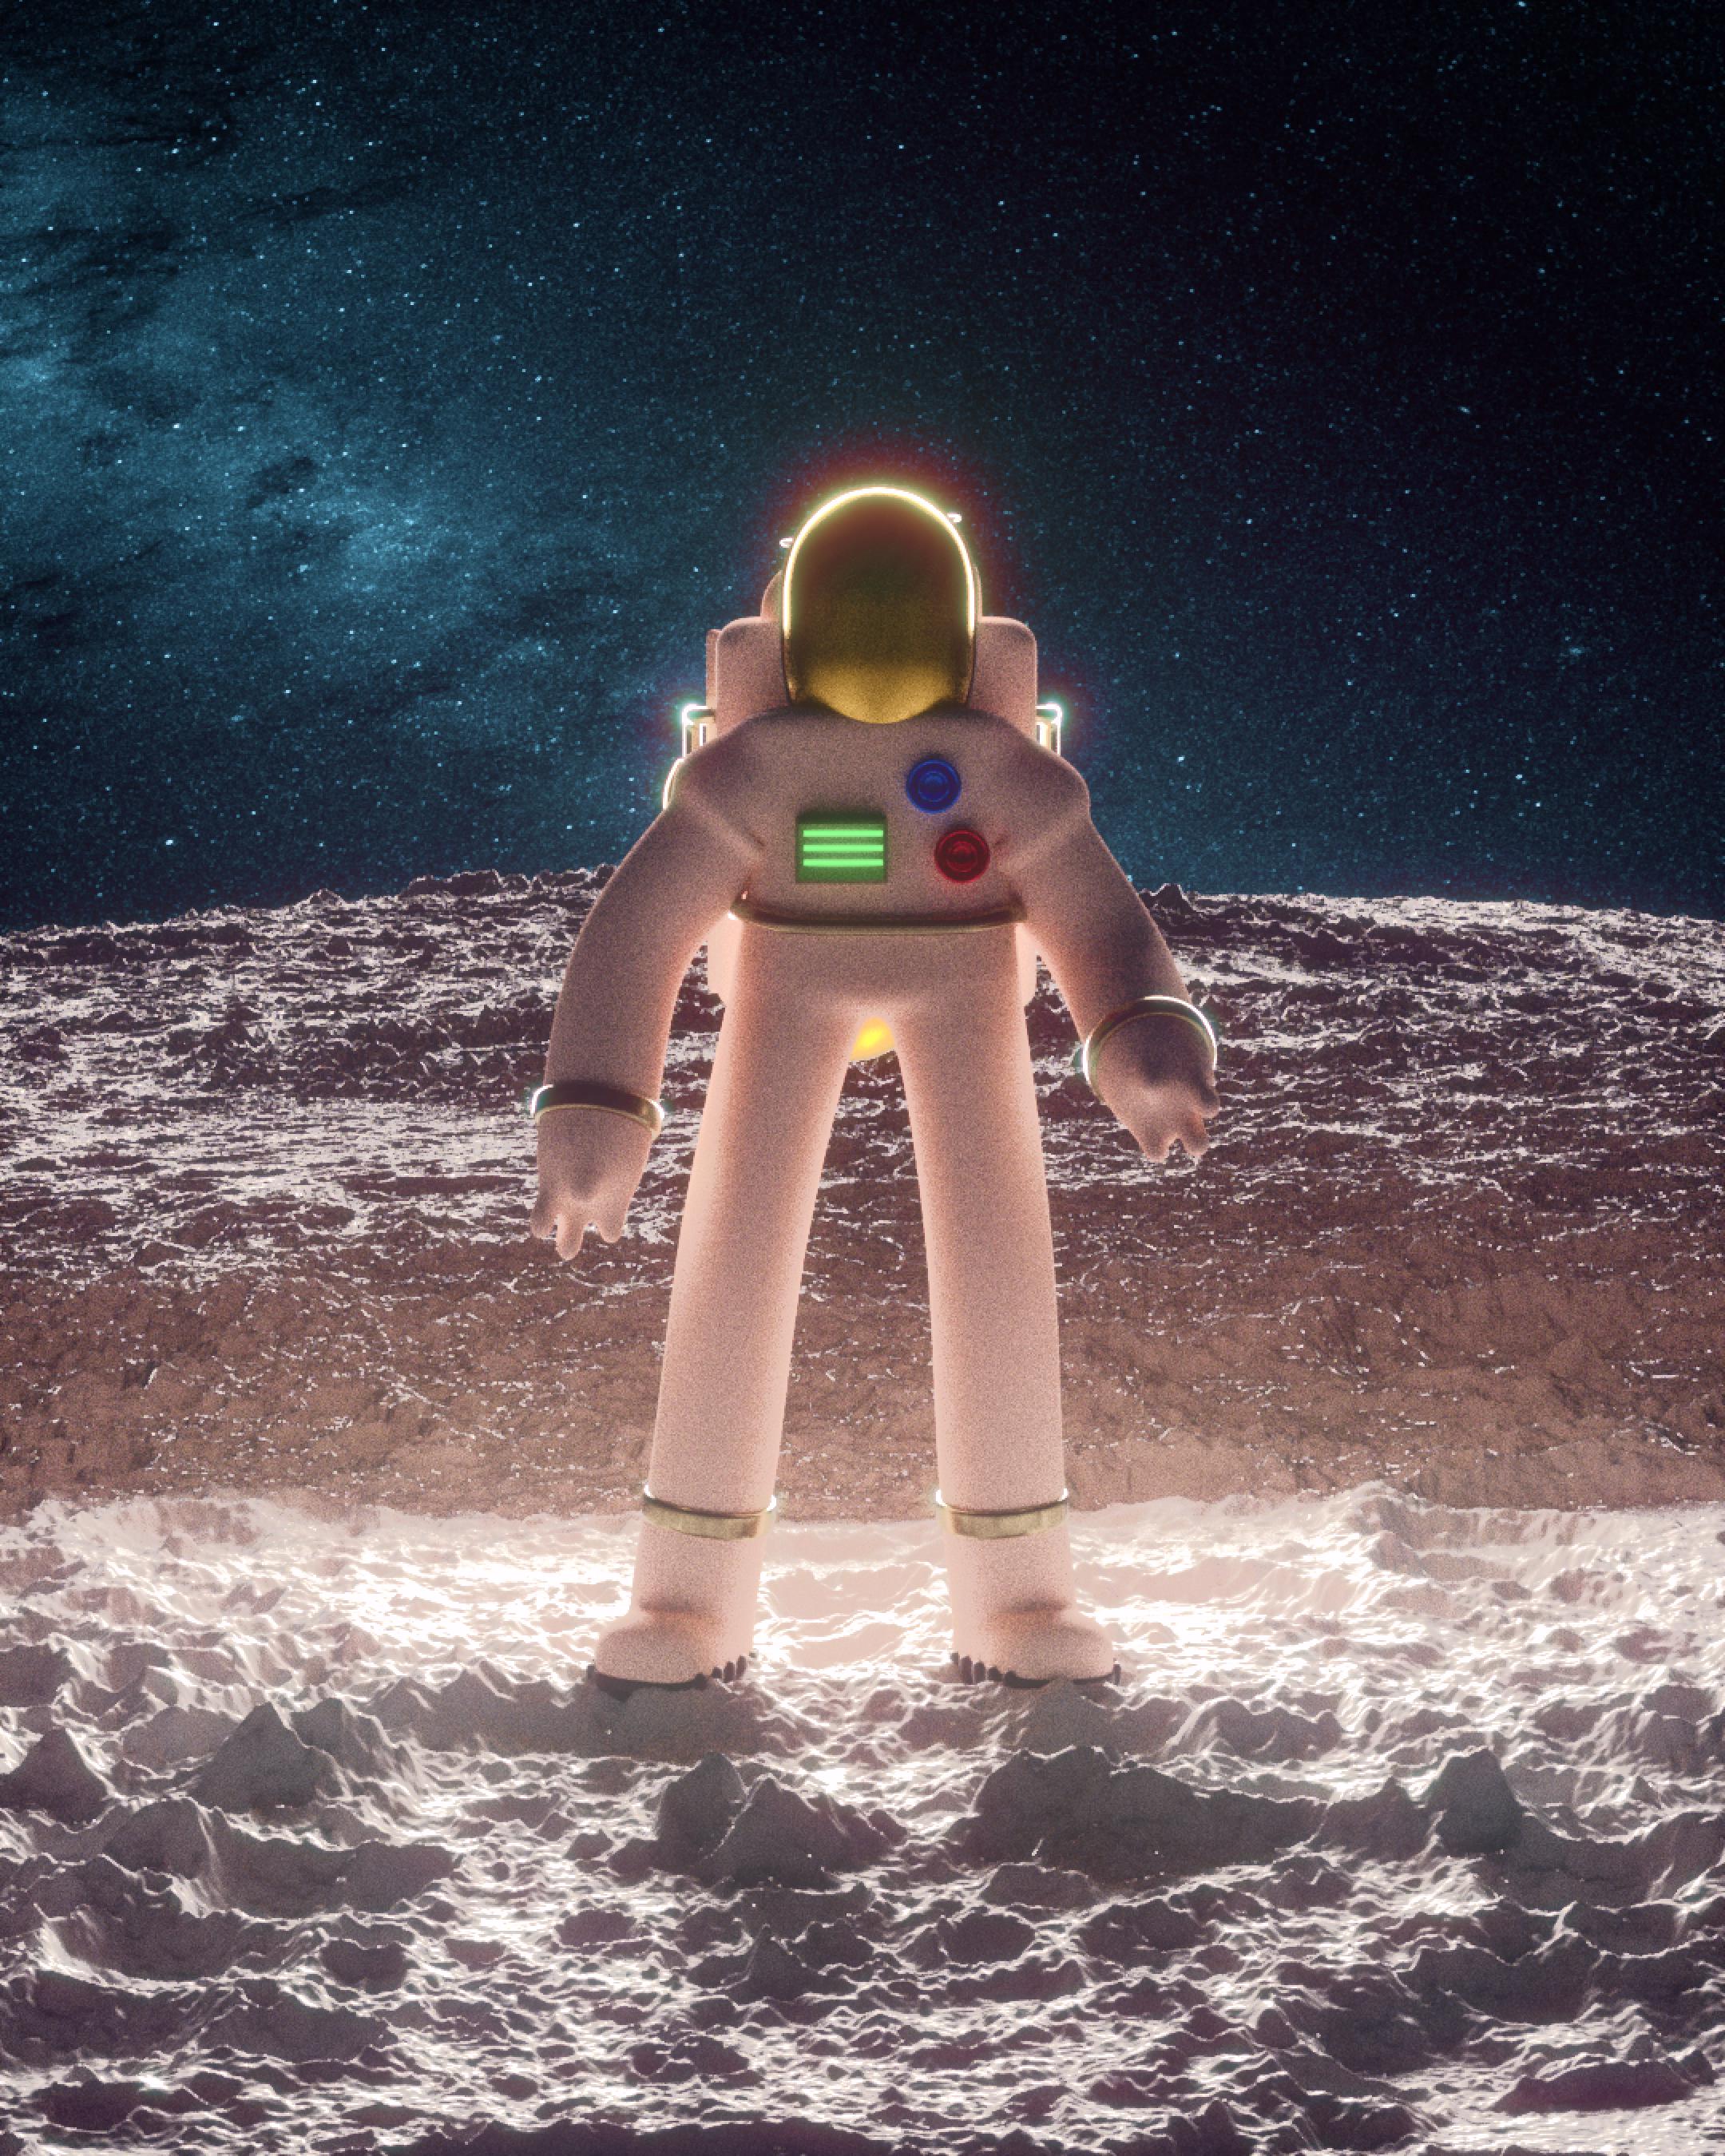 Cosmonaut from Icarus - 2021